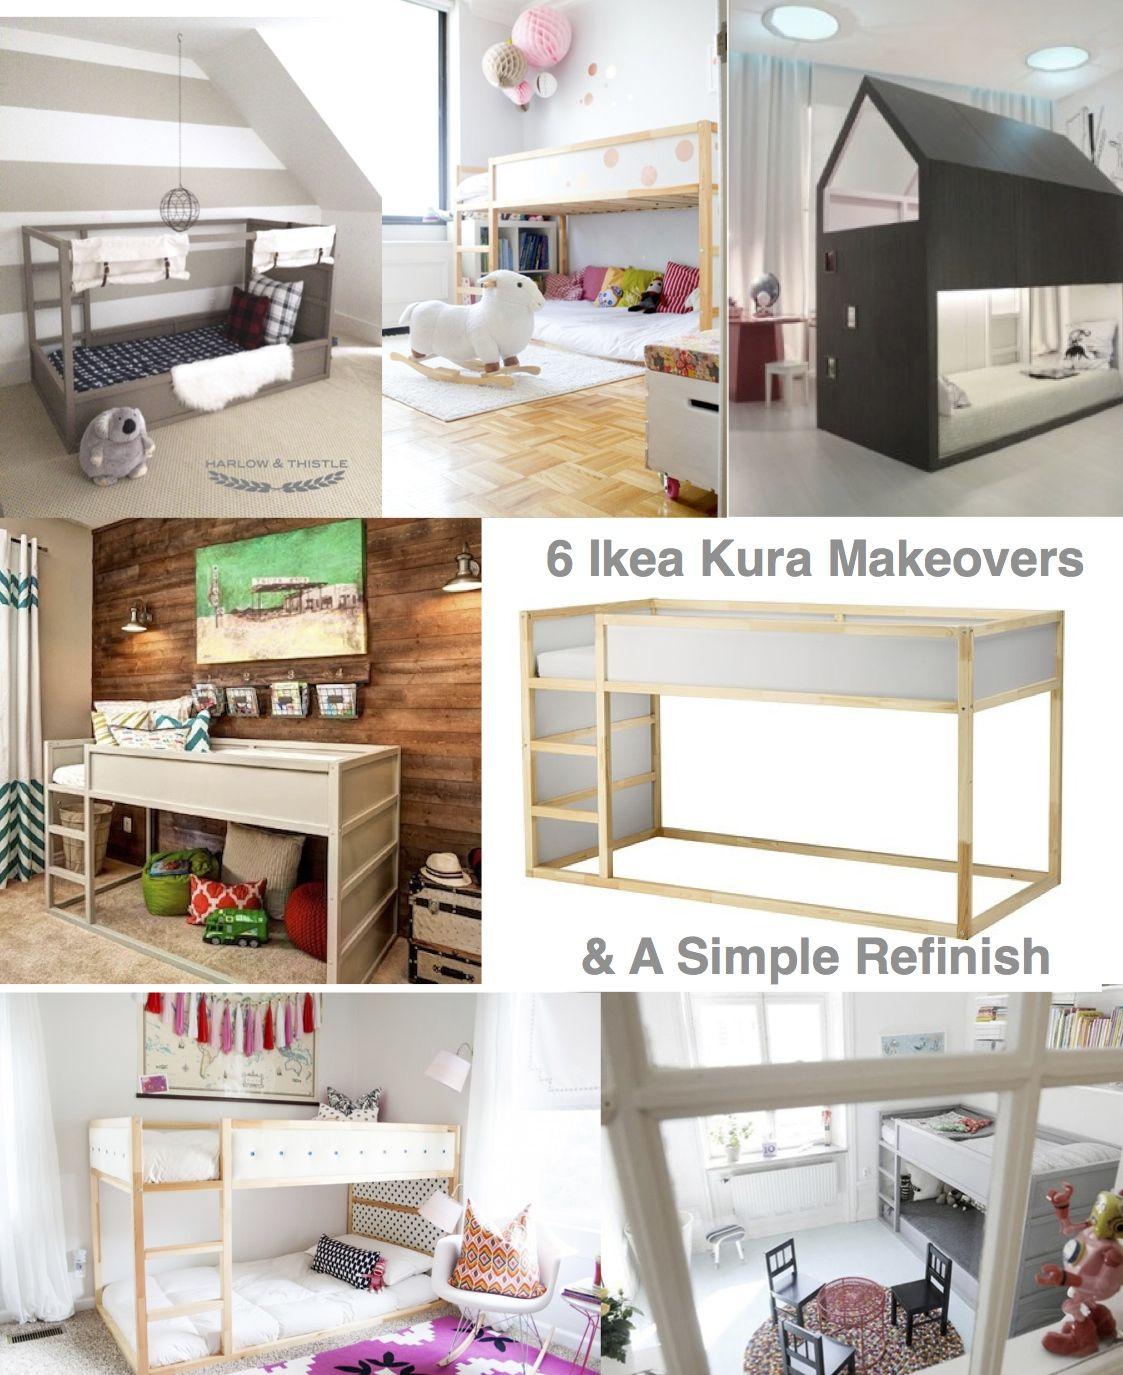 Letto A Castello Ikea Kura.100 Kura Hack Ideas Ikea Hack Kura Bunk Bed Youtube Ikea